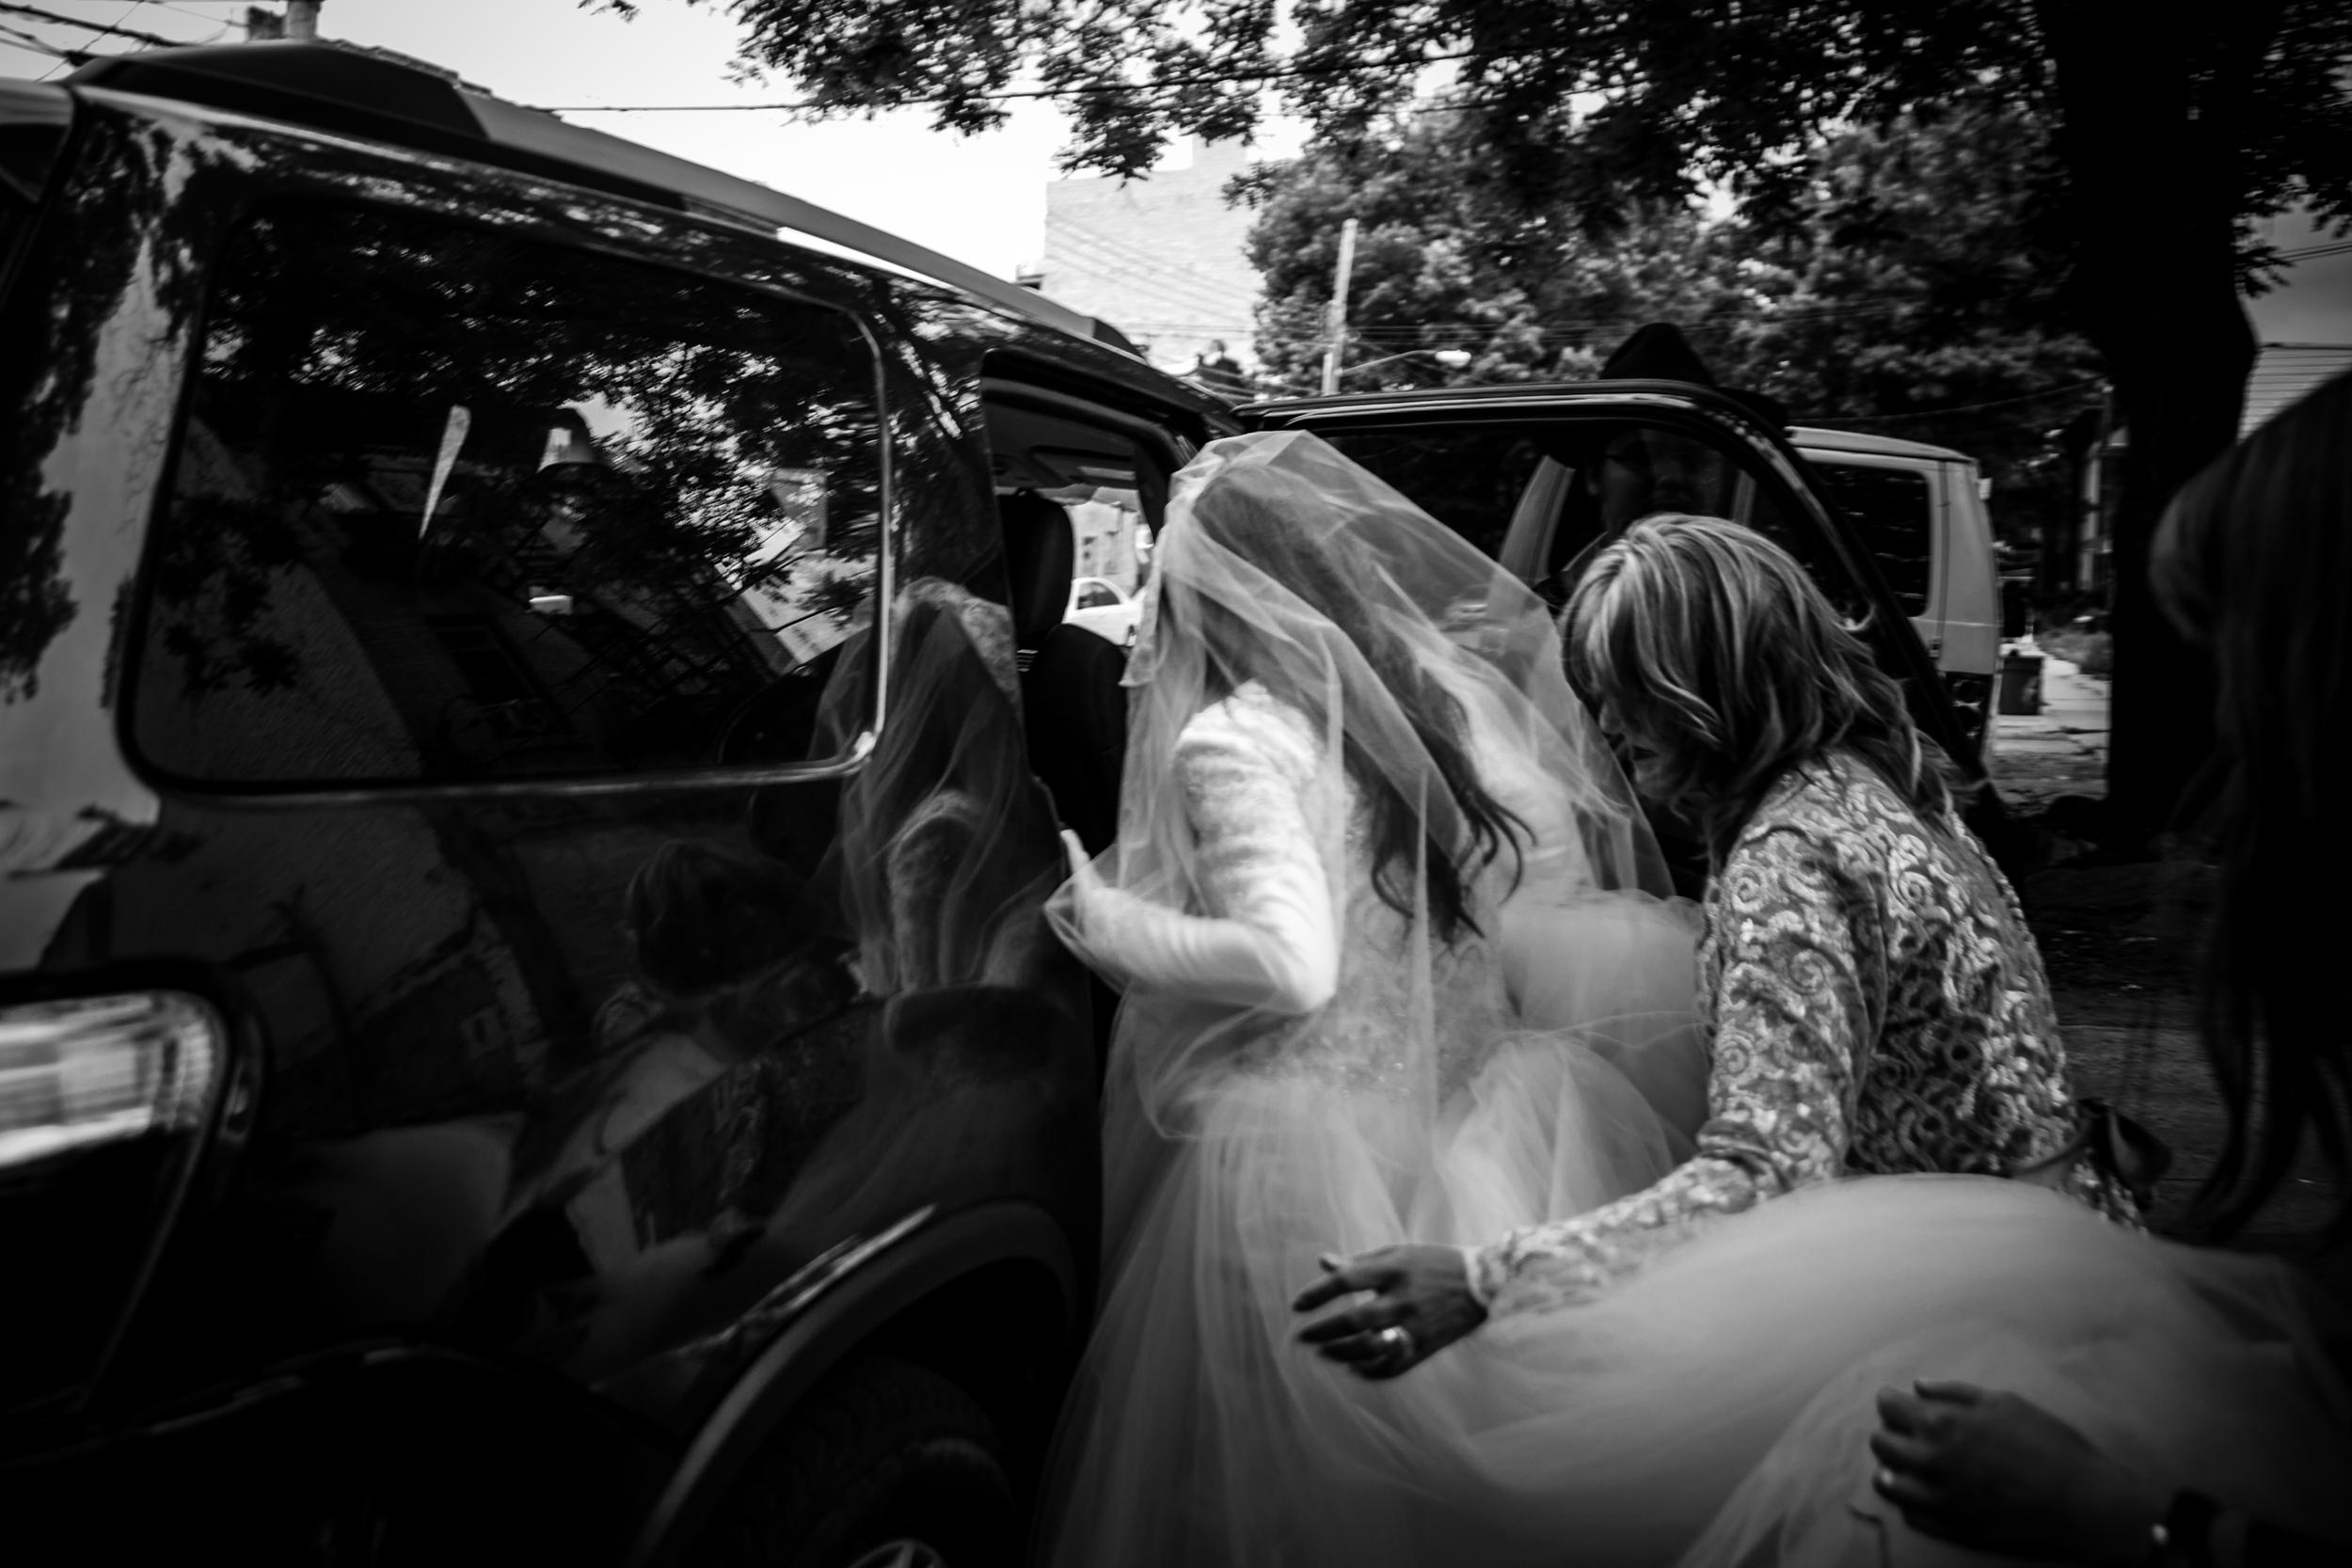 Wedding Iossi and Gitty Khafif  - Eliau Piha studio photography, new york, events, people 770 brooklyn -0354.jpg